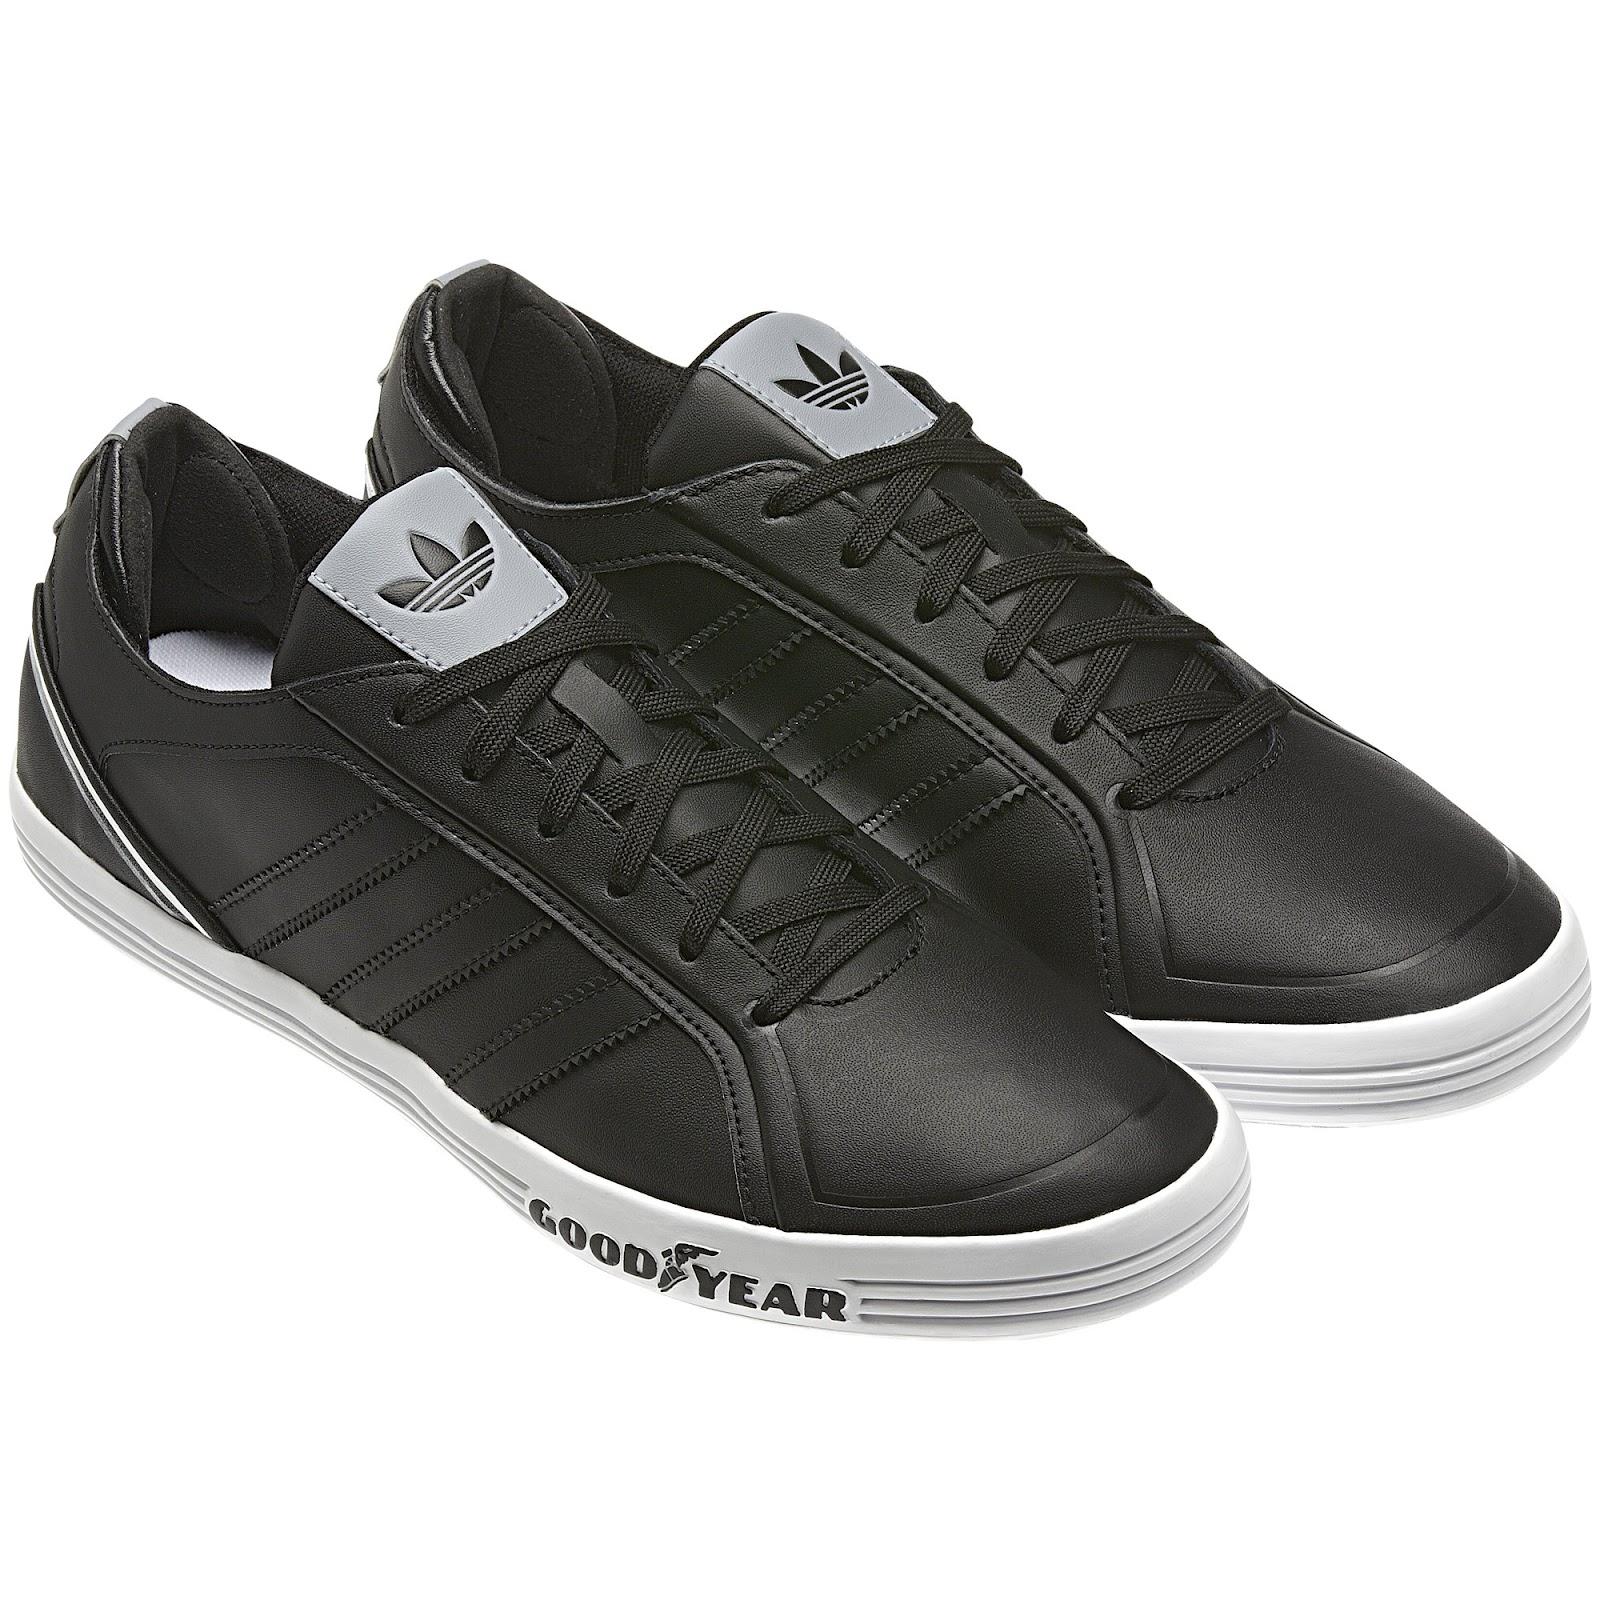 Adidas Goodyear Driving Shoes